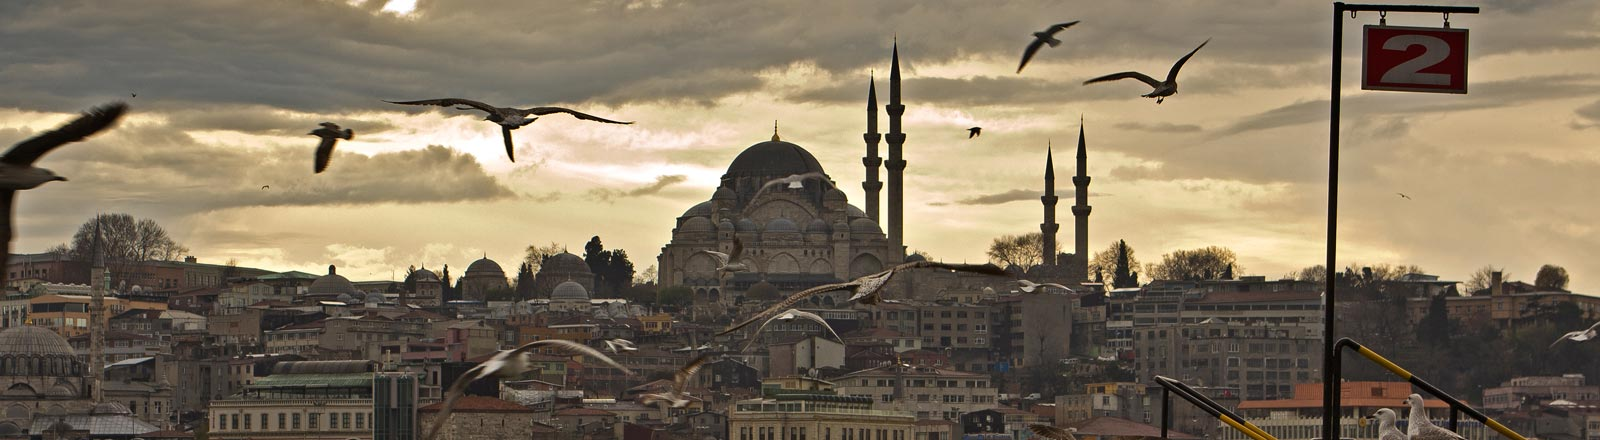 Panorama der Stadt Istanbul.